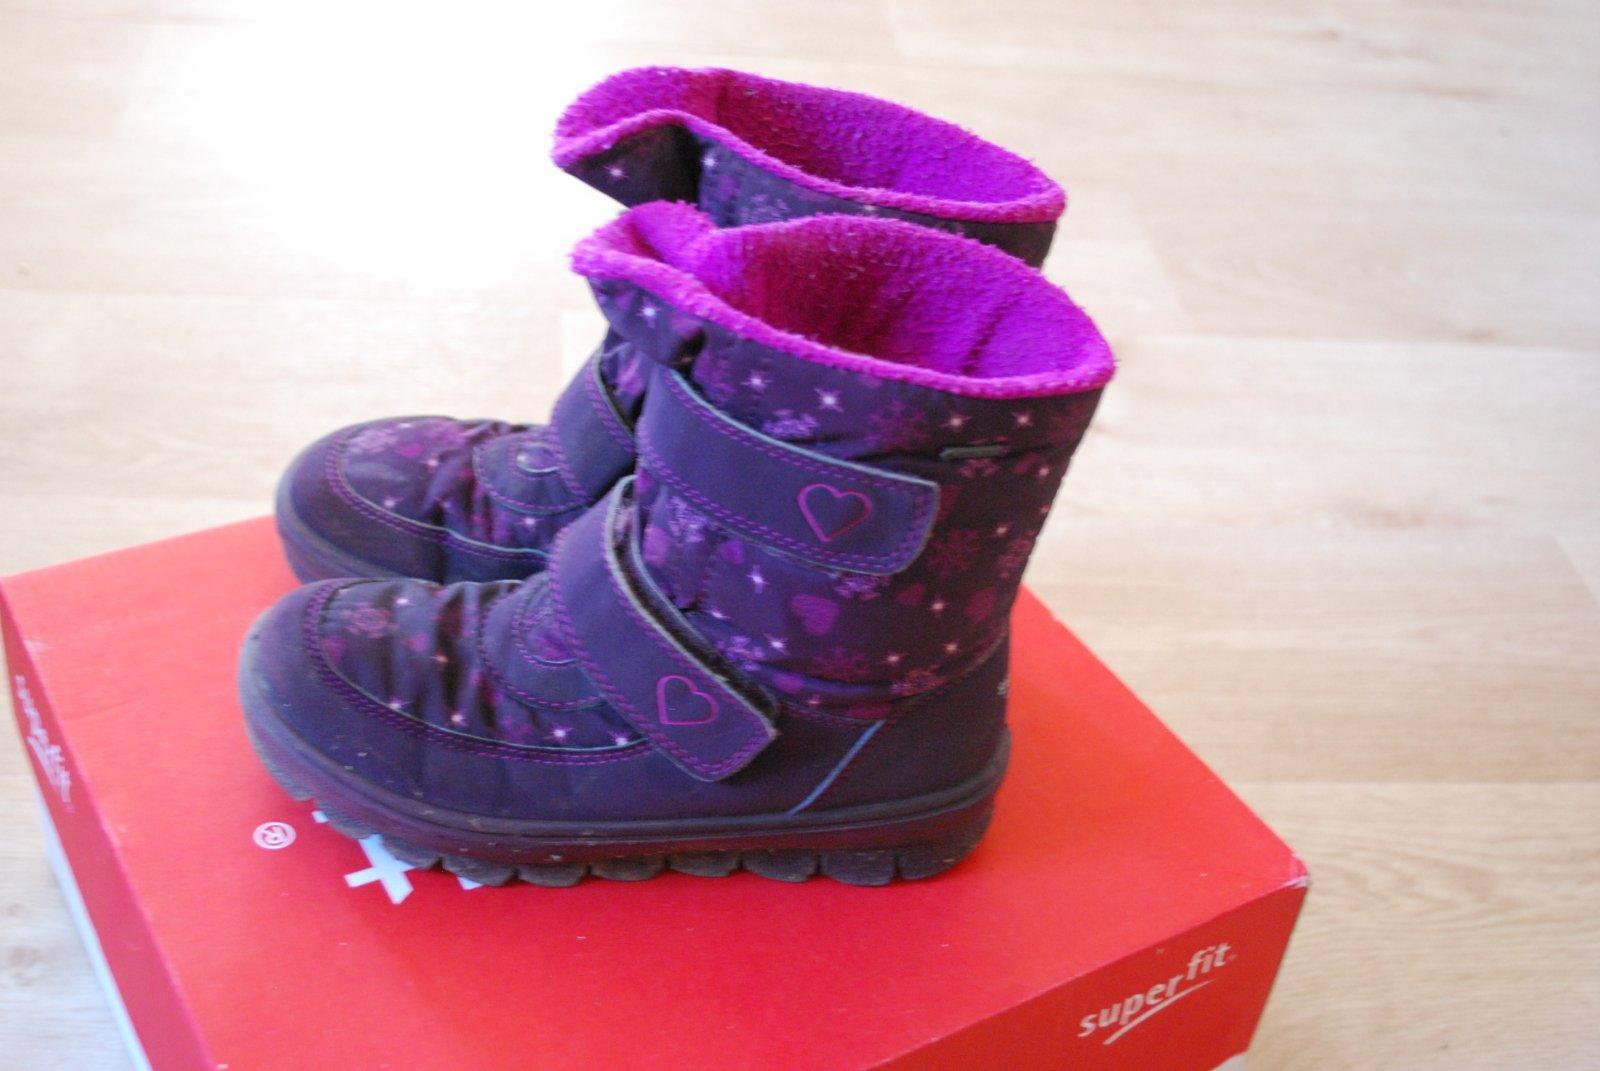 Zimní boty s goretex gore-tex nepromokavé v záruce 3641925efd